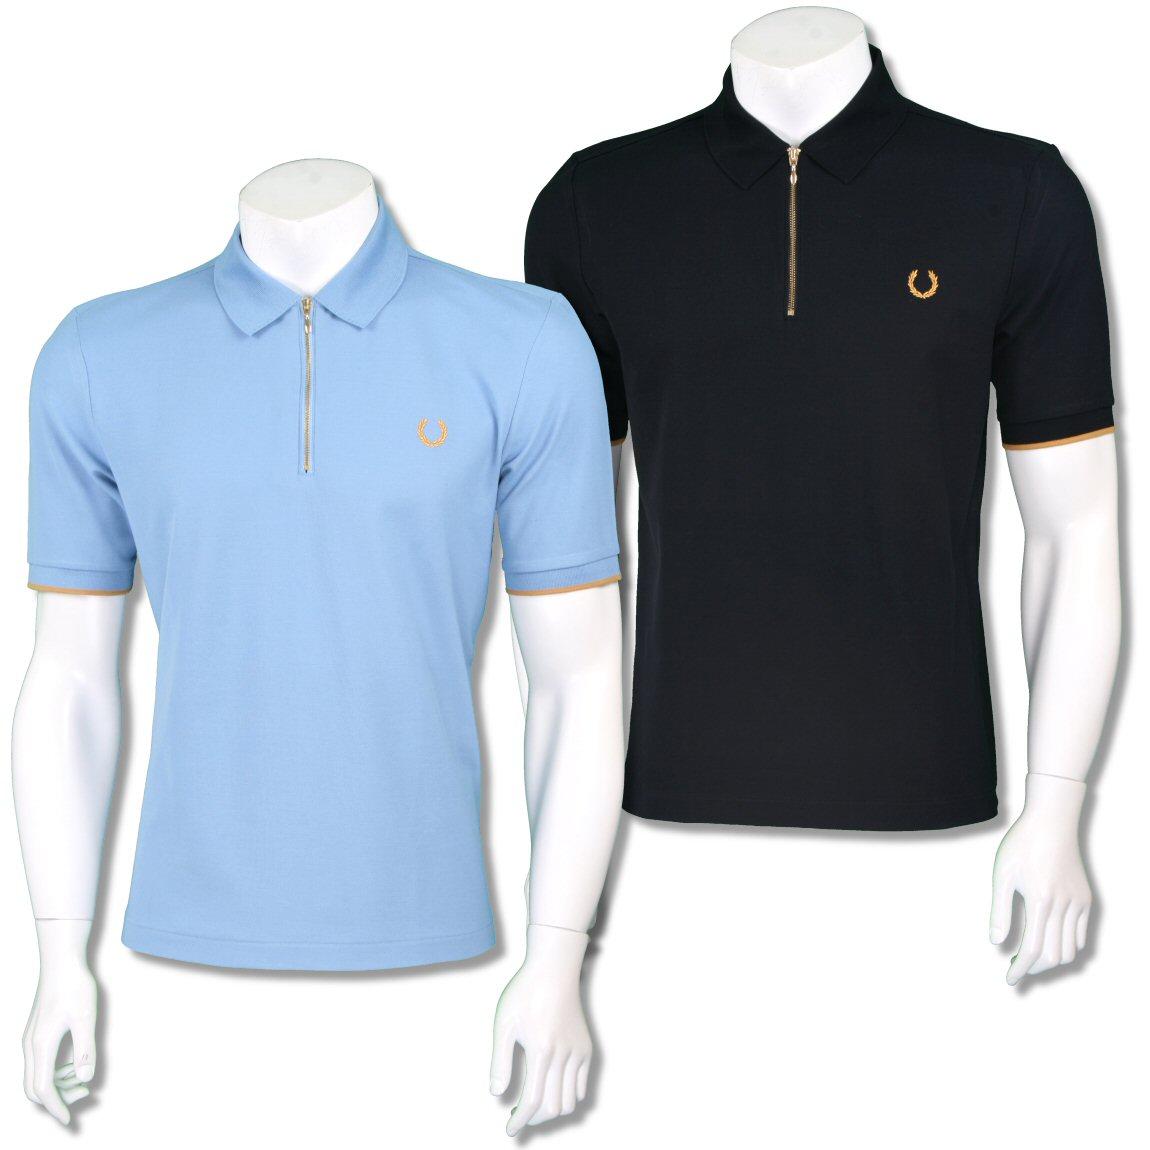 086c1b83f Fred Perry Ltd Edition Miles Kane Zip Collar Polo Shirt Thumbnail 1 ...